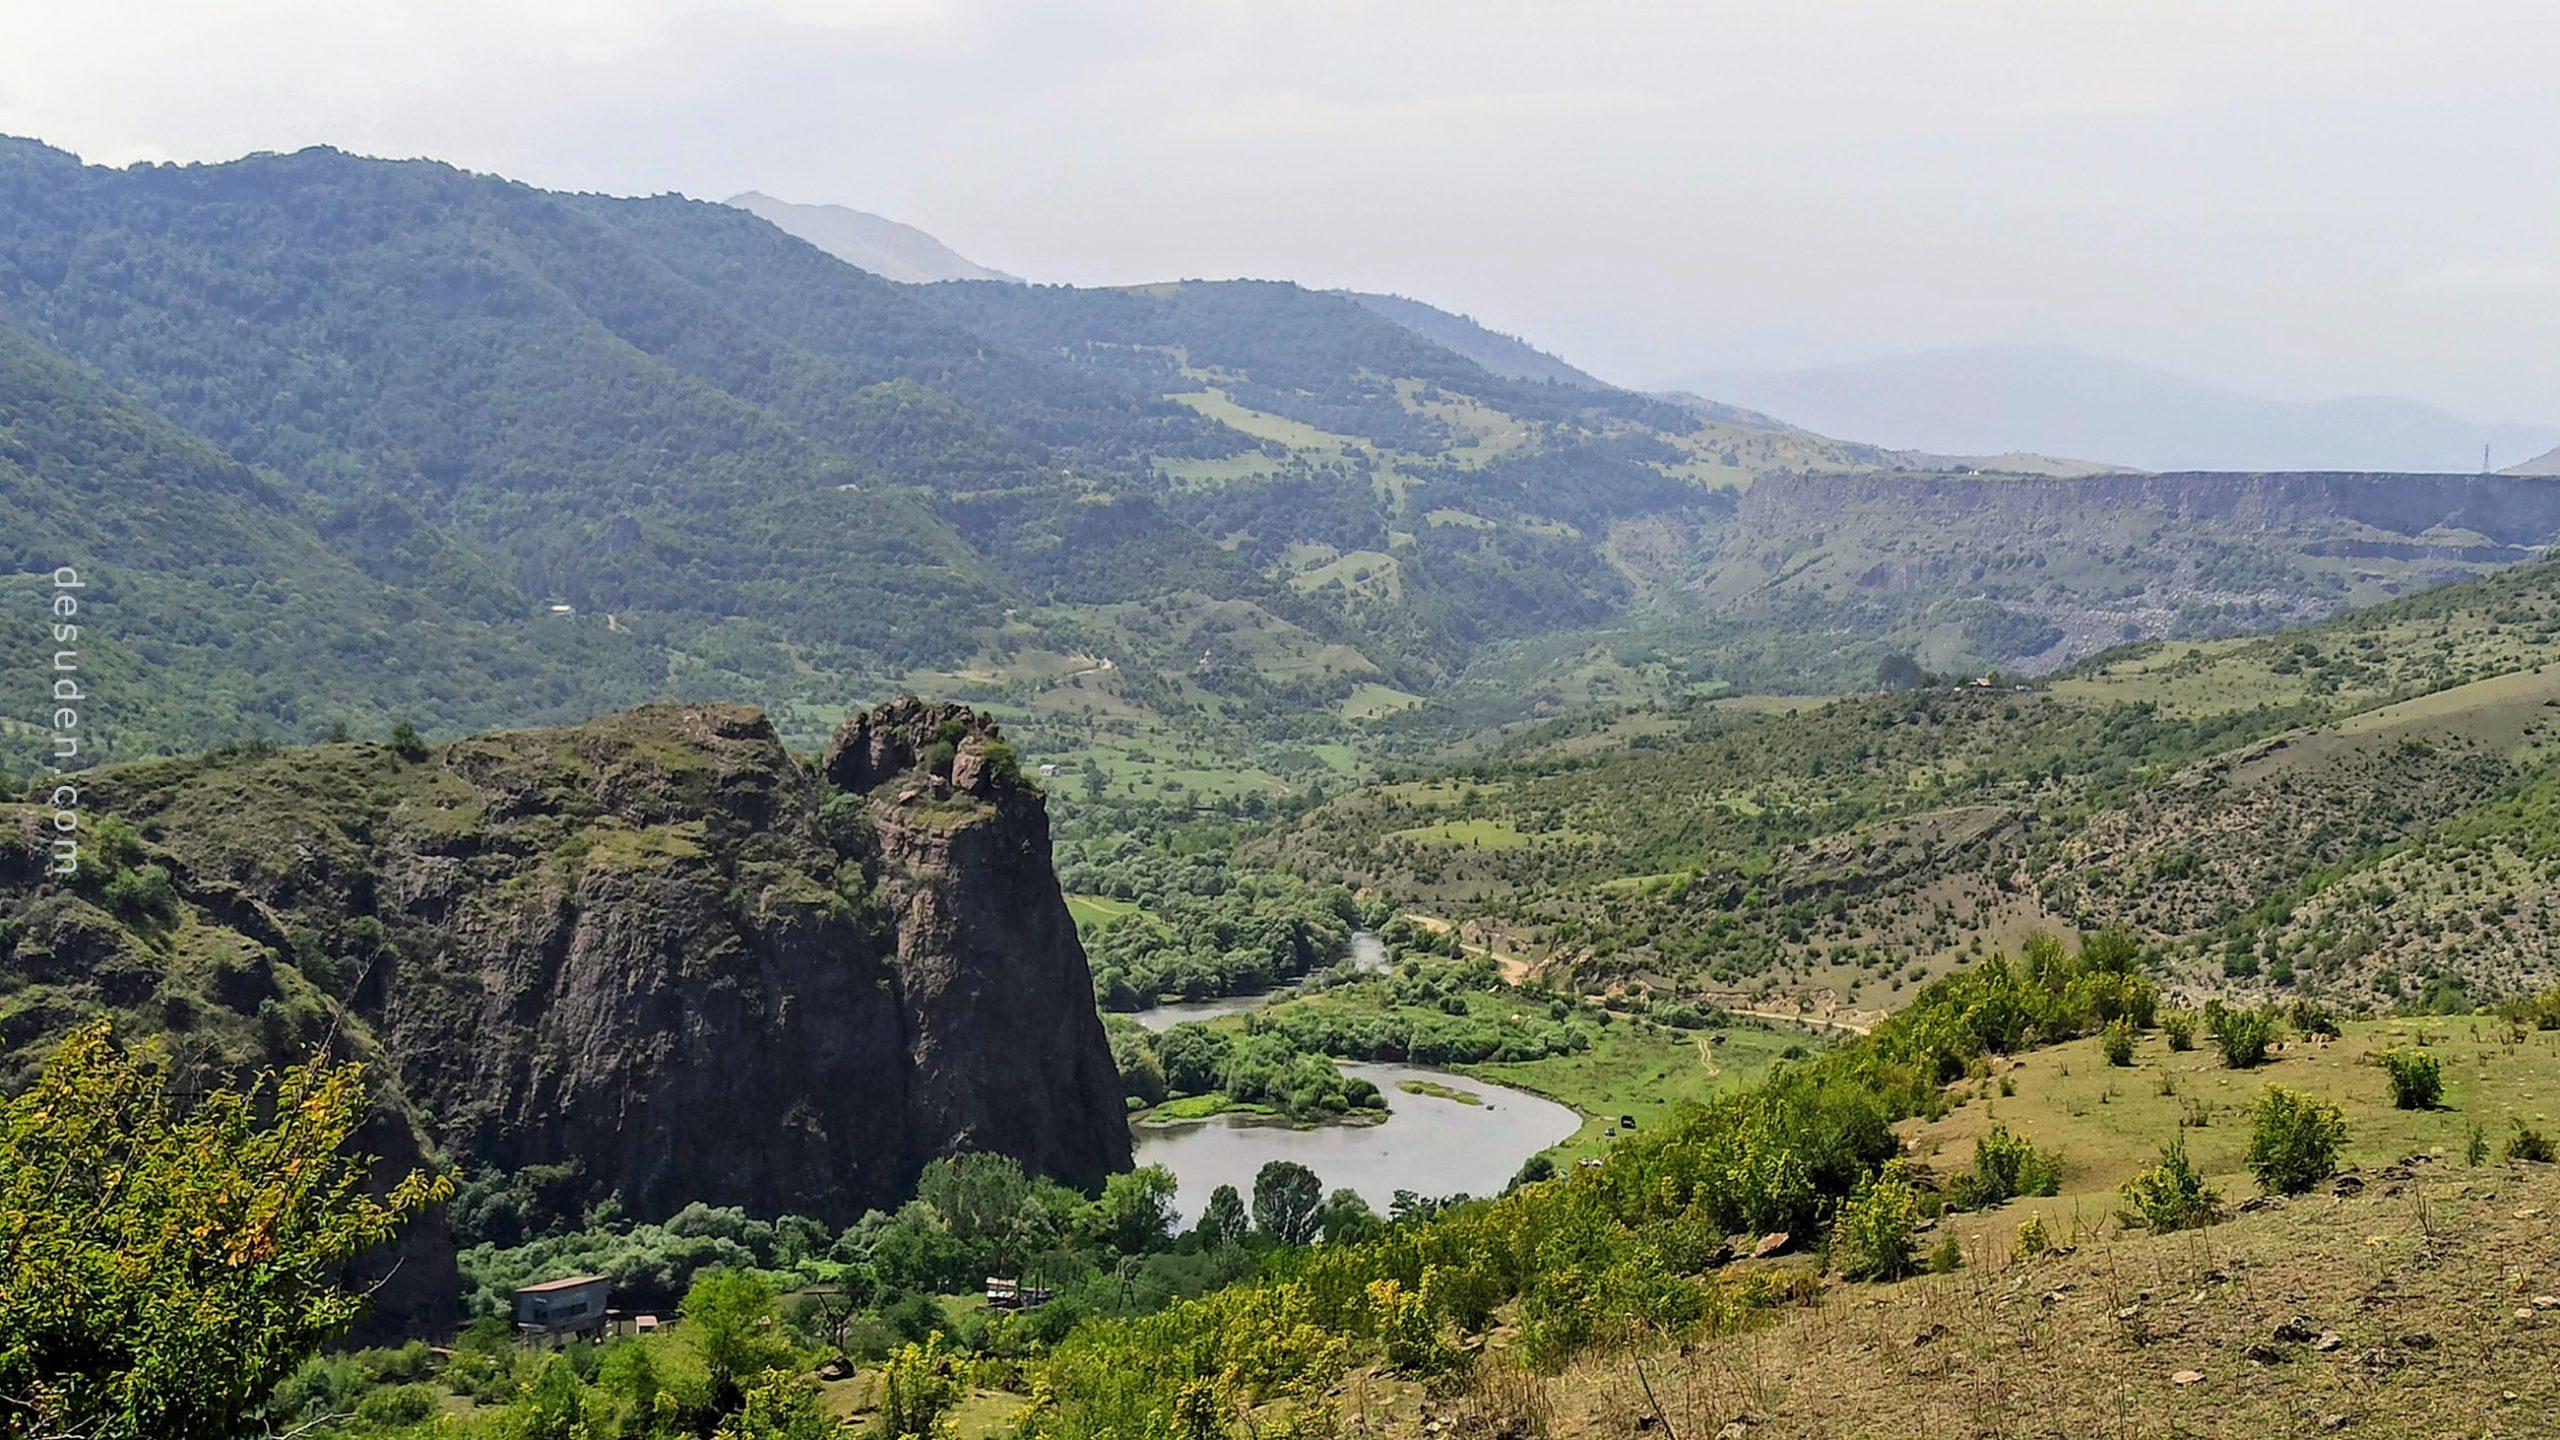 Arevatsag canyon - Ghachaghan